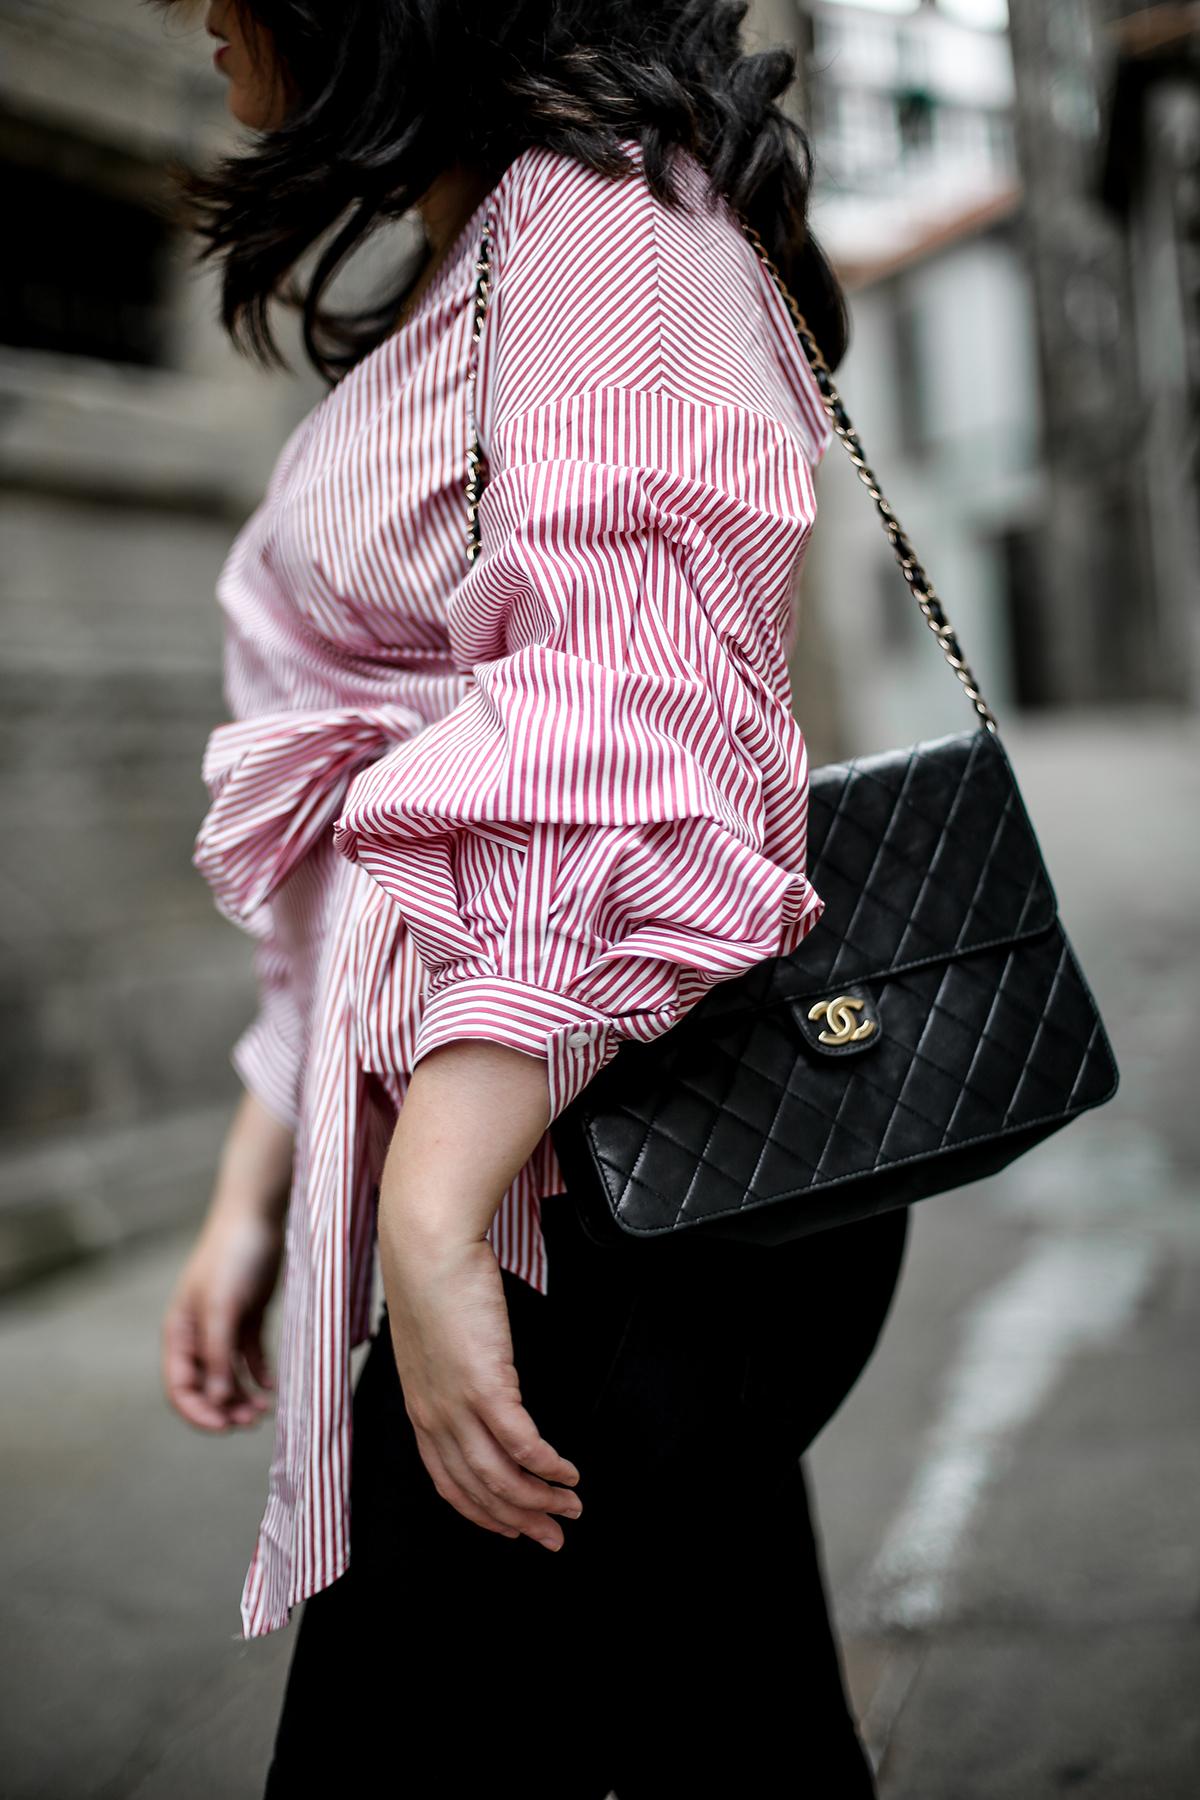 blusa-cruzada-zara-chanel-vintage-vestiaire-collective-myblueberrynightsblog2